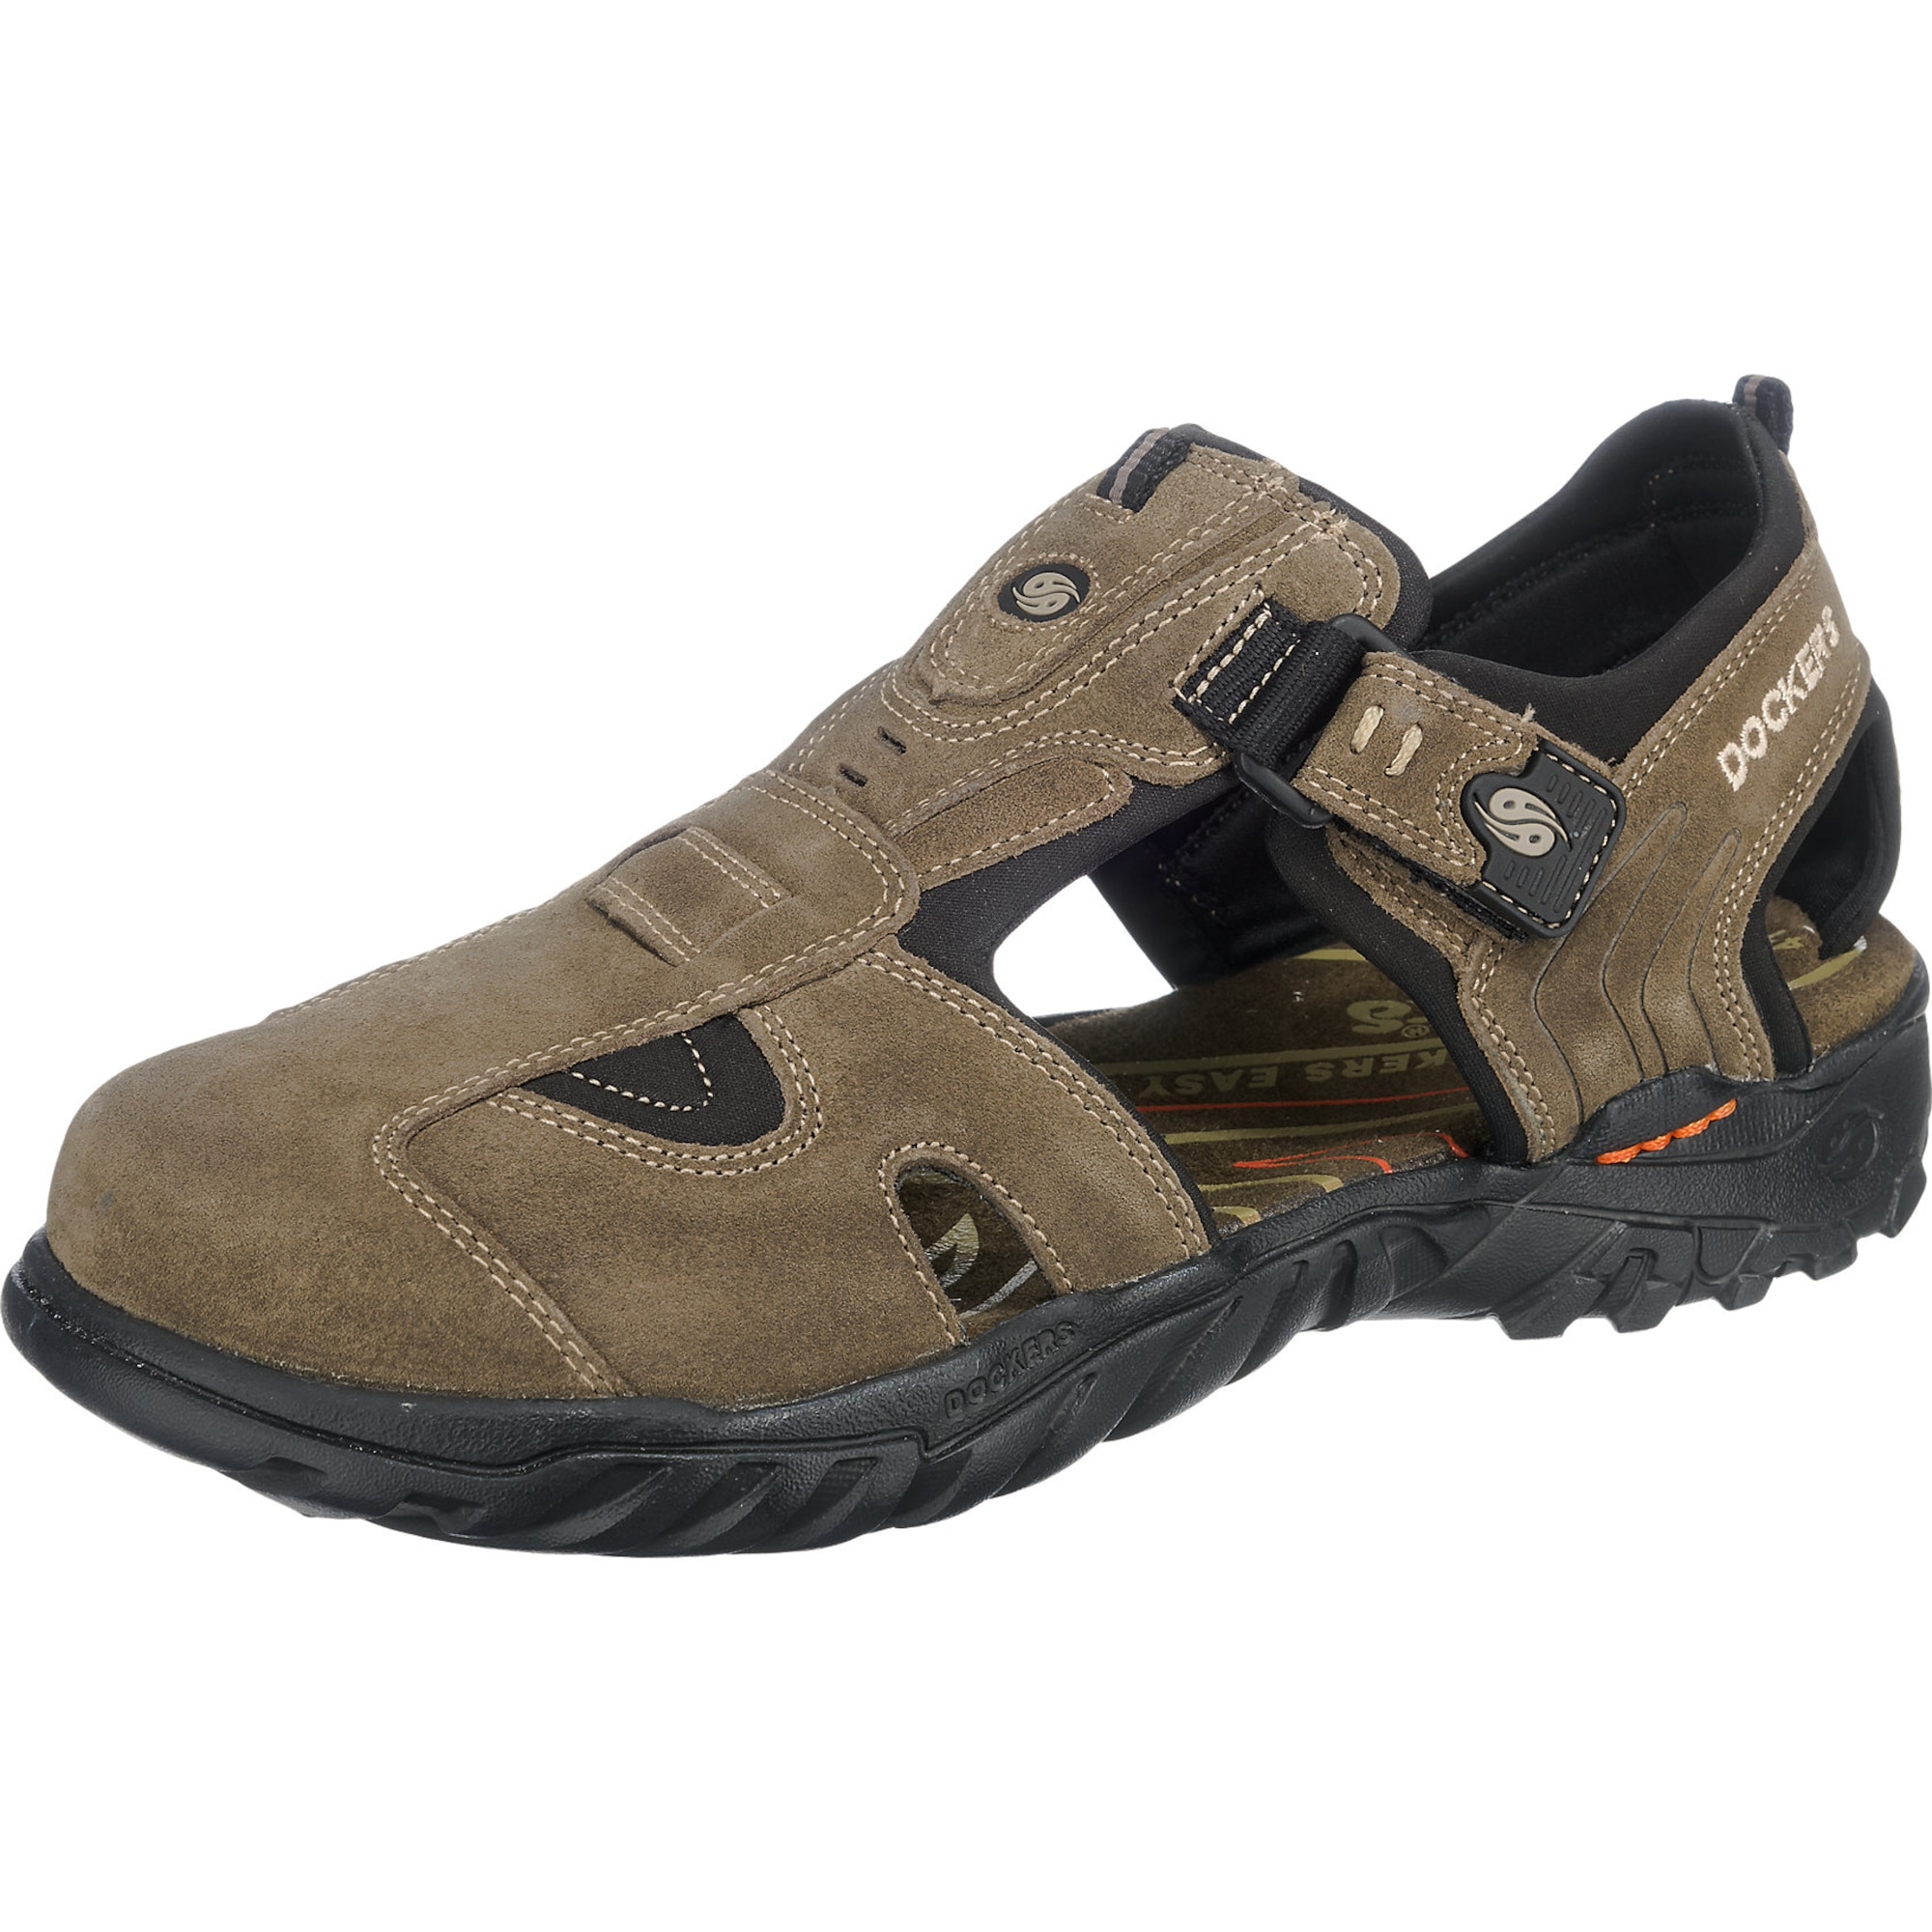 Halbgeschlossene Outdoor-Sandale